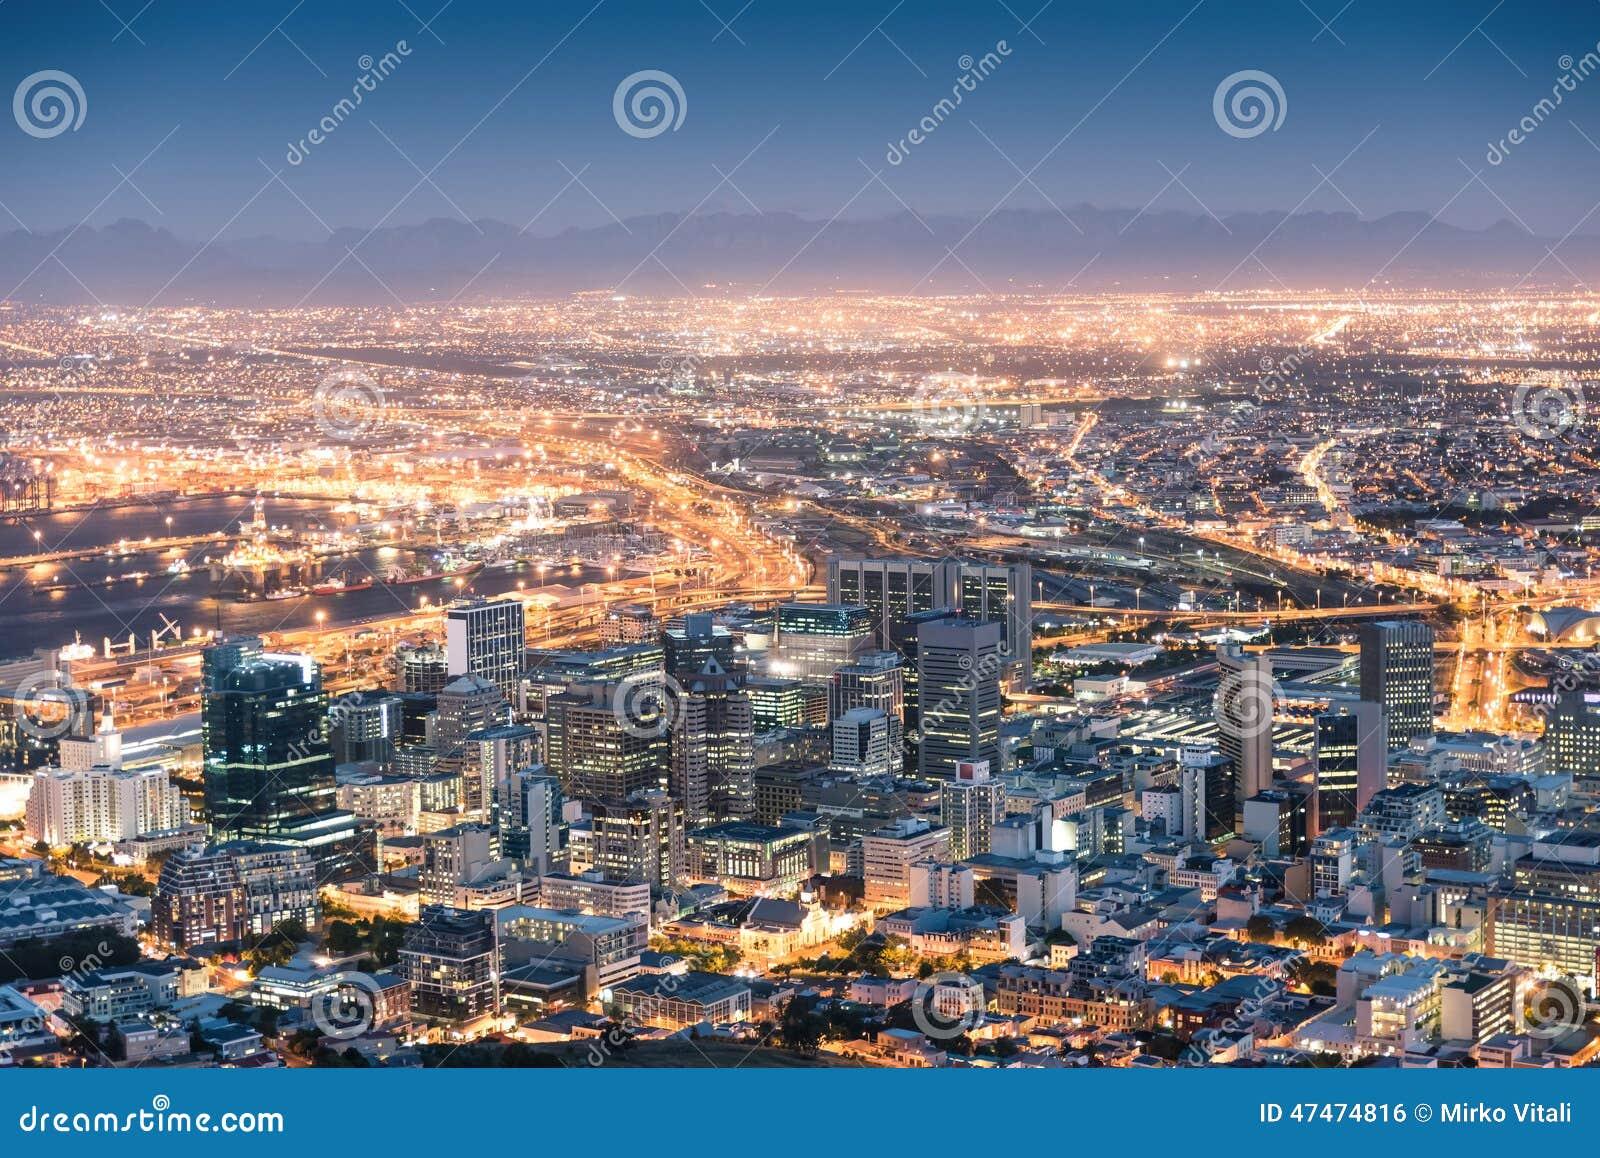 Vista aérea de Cape Town de la colina de la señal después de la puesta del sol